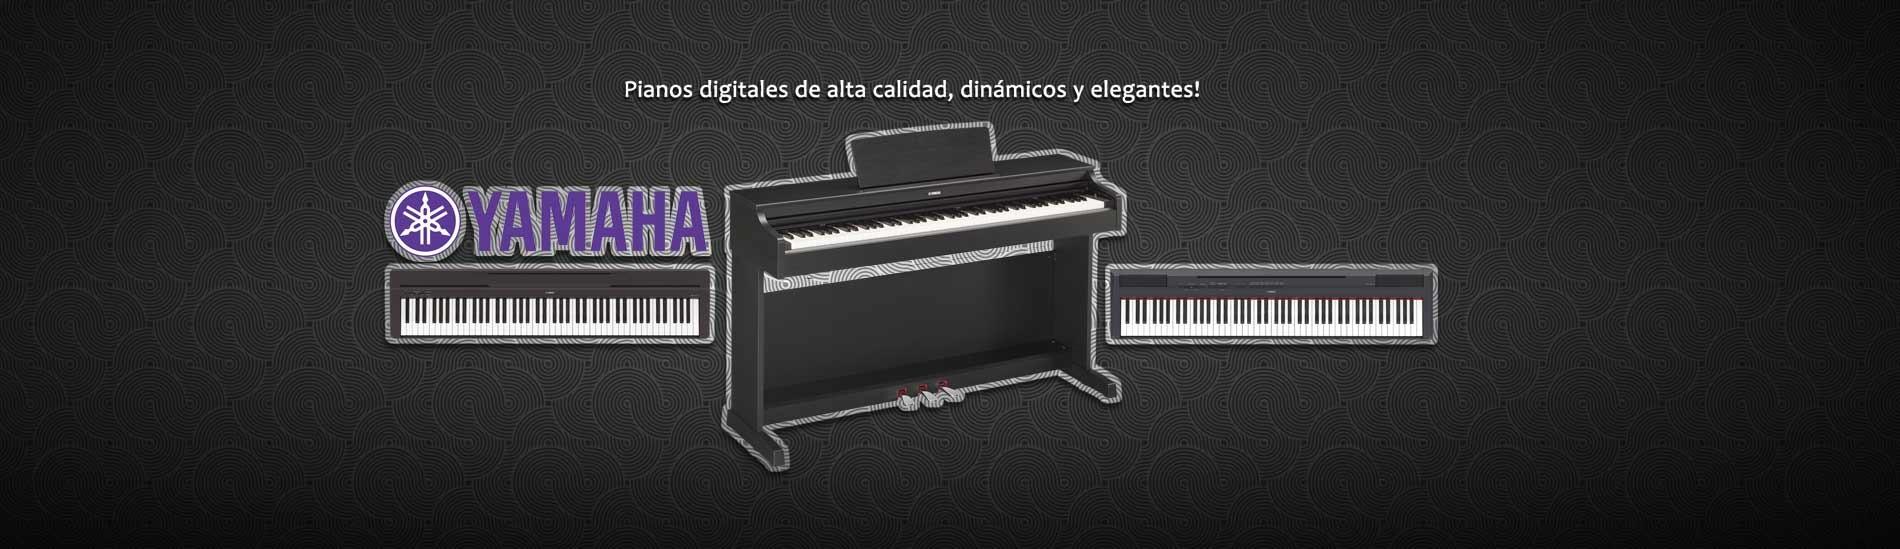 Pianos digitales Yamaha